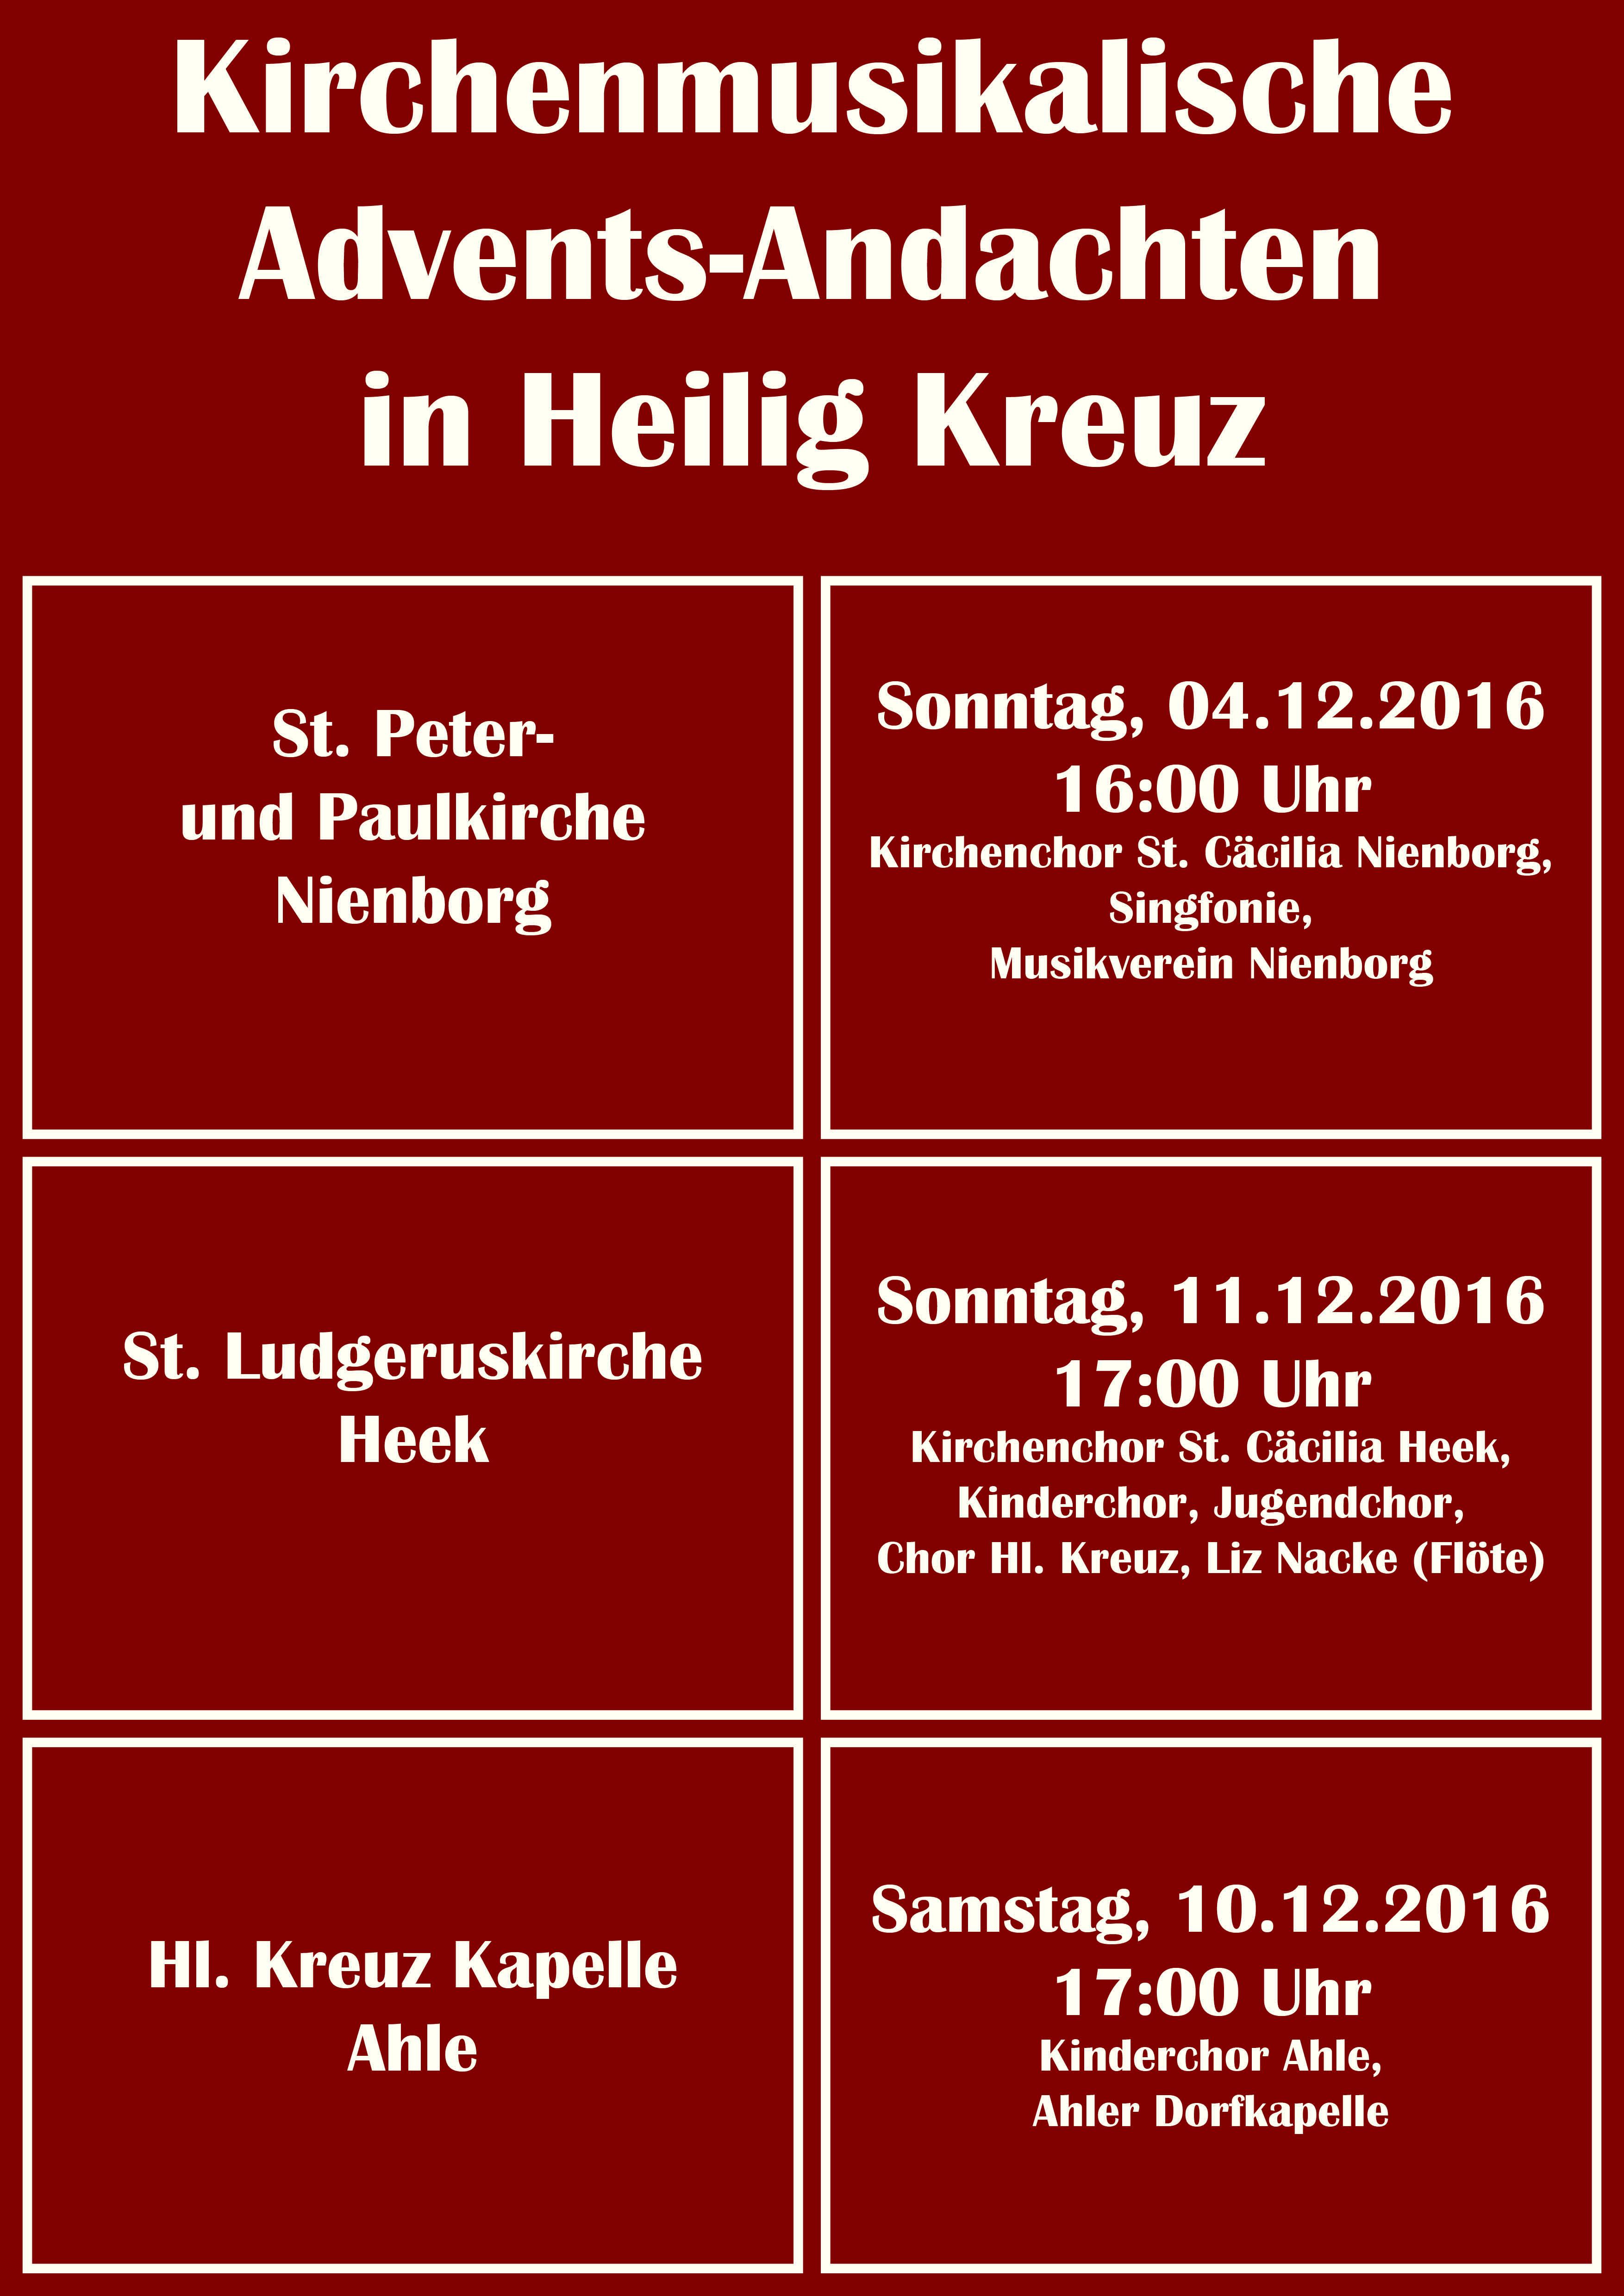 kirchenmusikalische-adventsandachten-2016